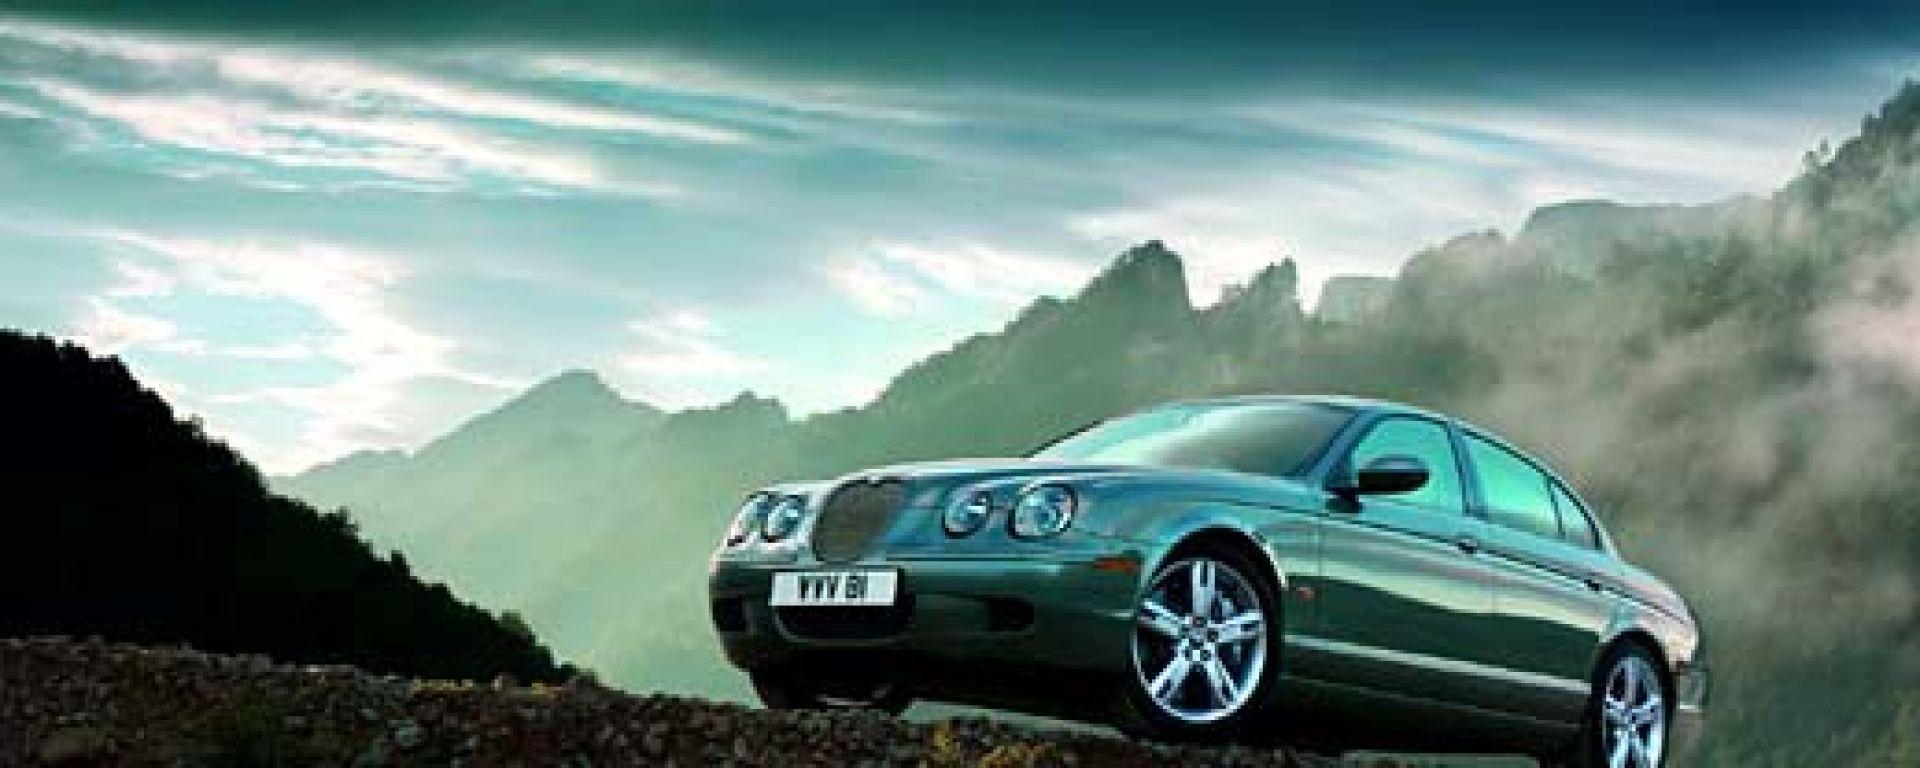 Anteprima:Jaguar S-Type 2004